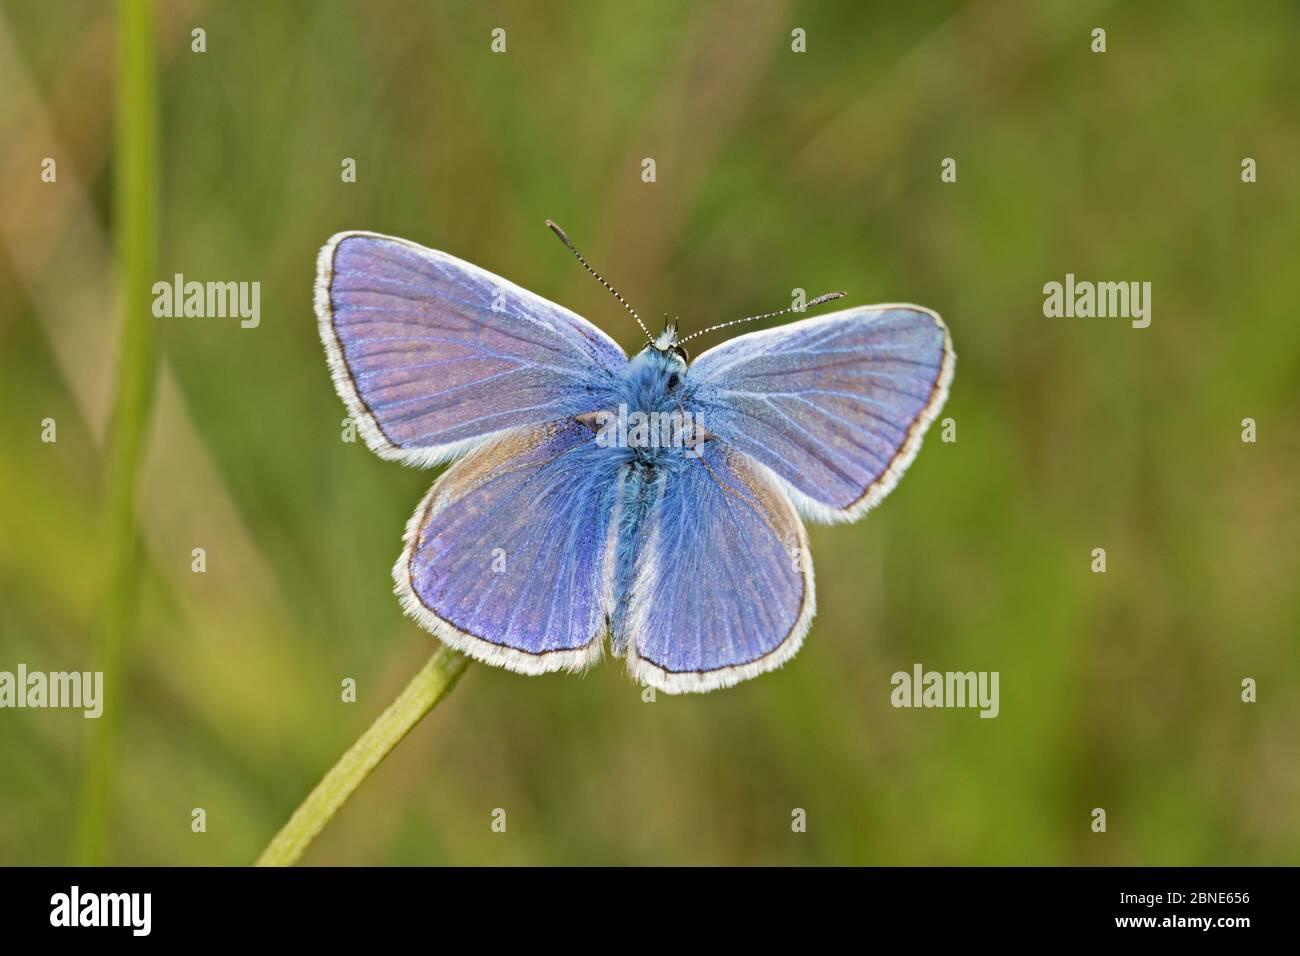 Mariposa azul común macho (Polyommatus icarus) Reserva Natural del Parque Sutcliffe, Londres, Eltham, Londres, Reino Unido. Agosto Foto de stock